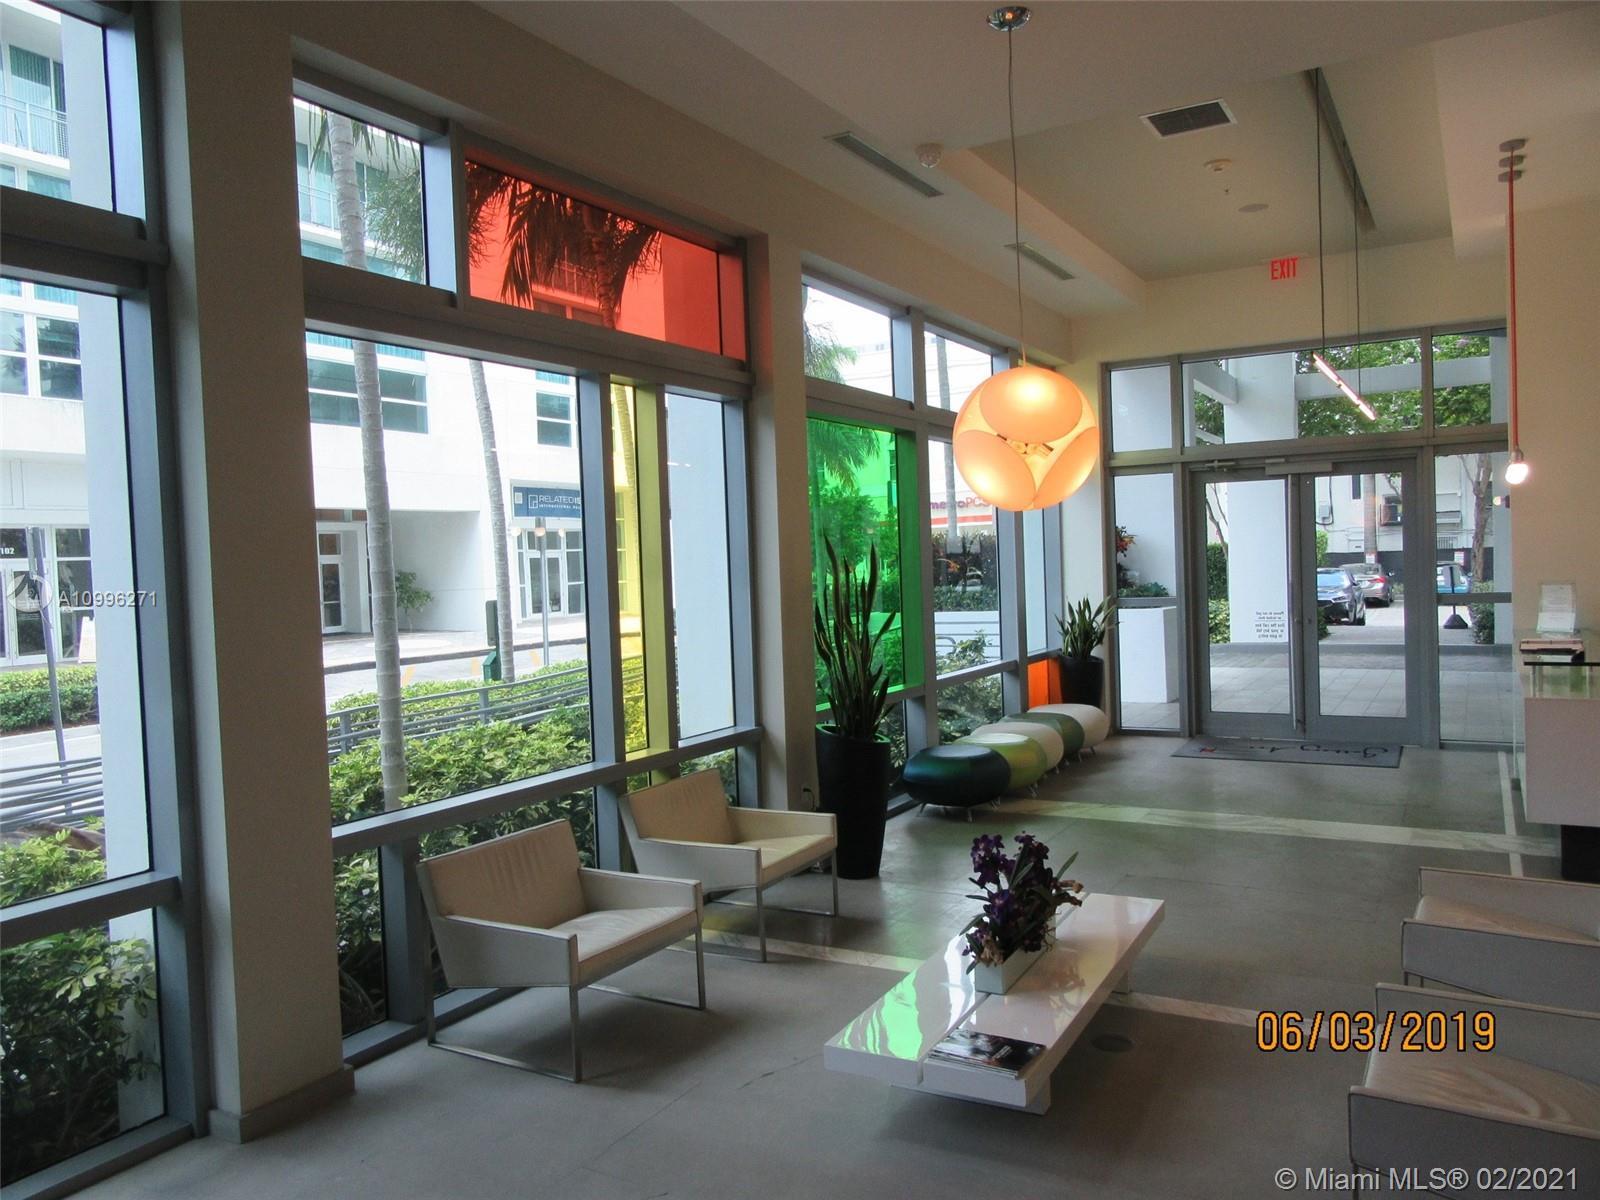 Gallery Art #1405 - 02 - photo